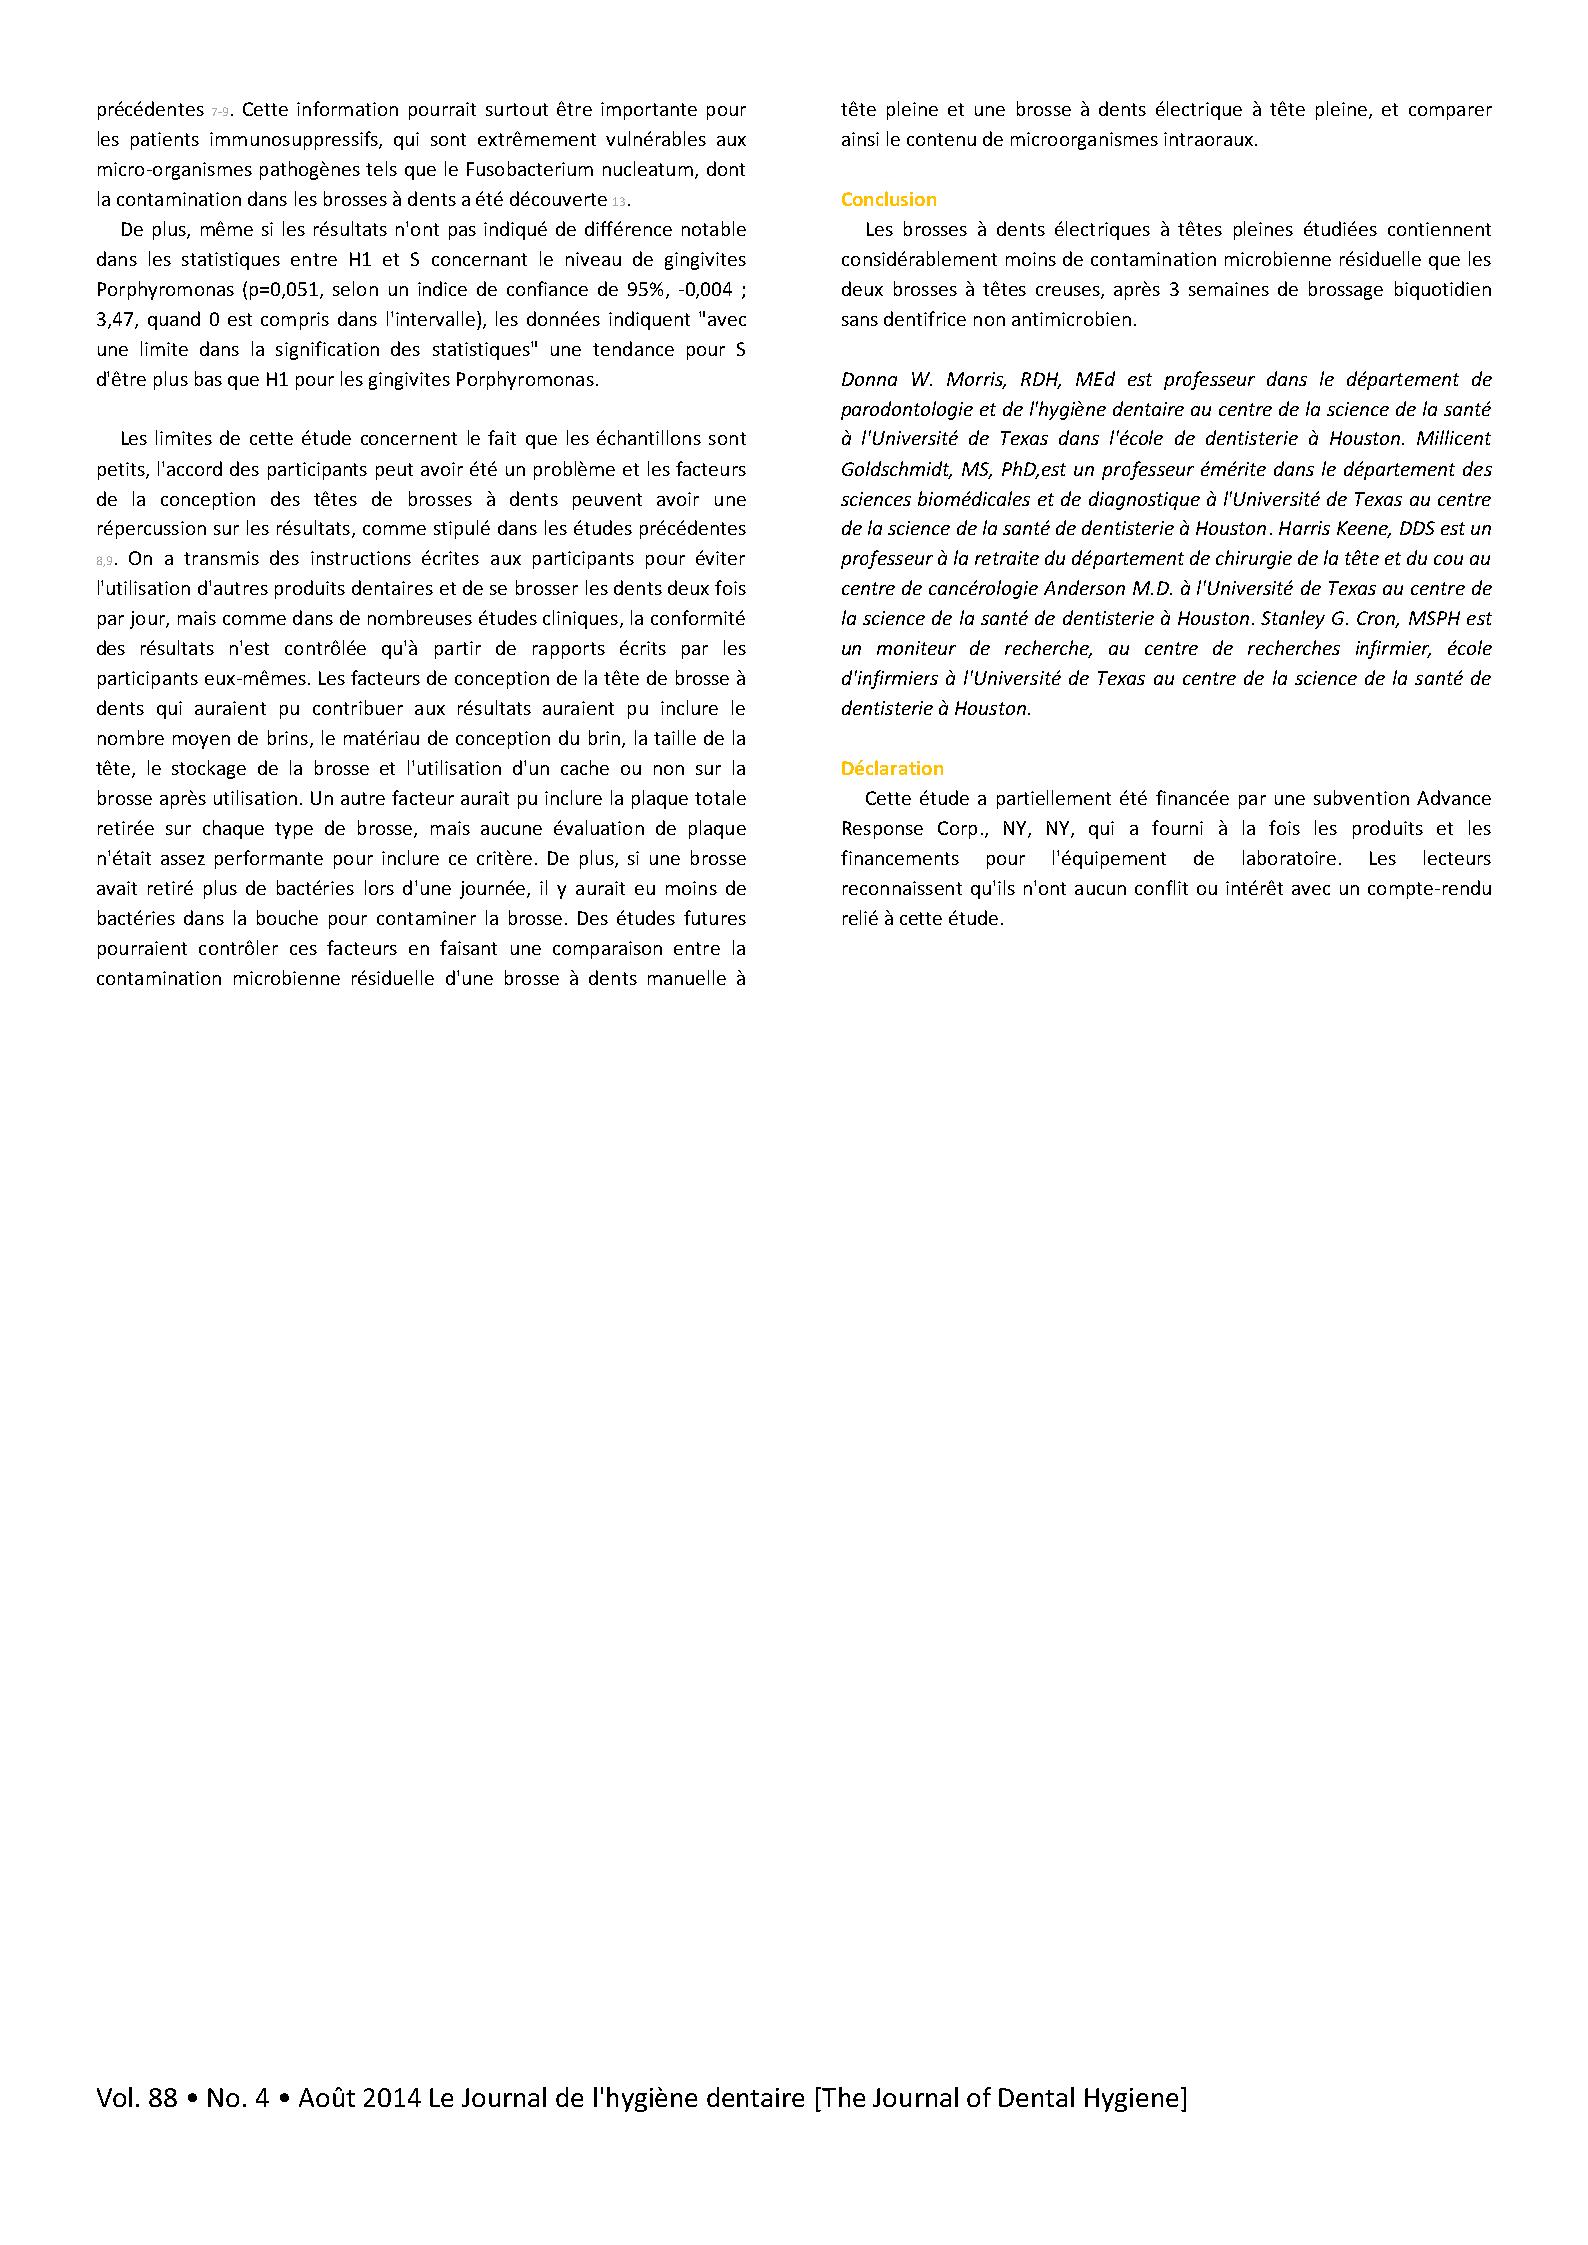 Etude9-page4